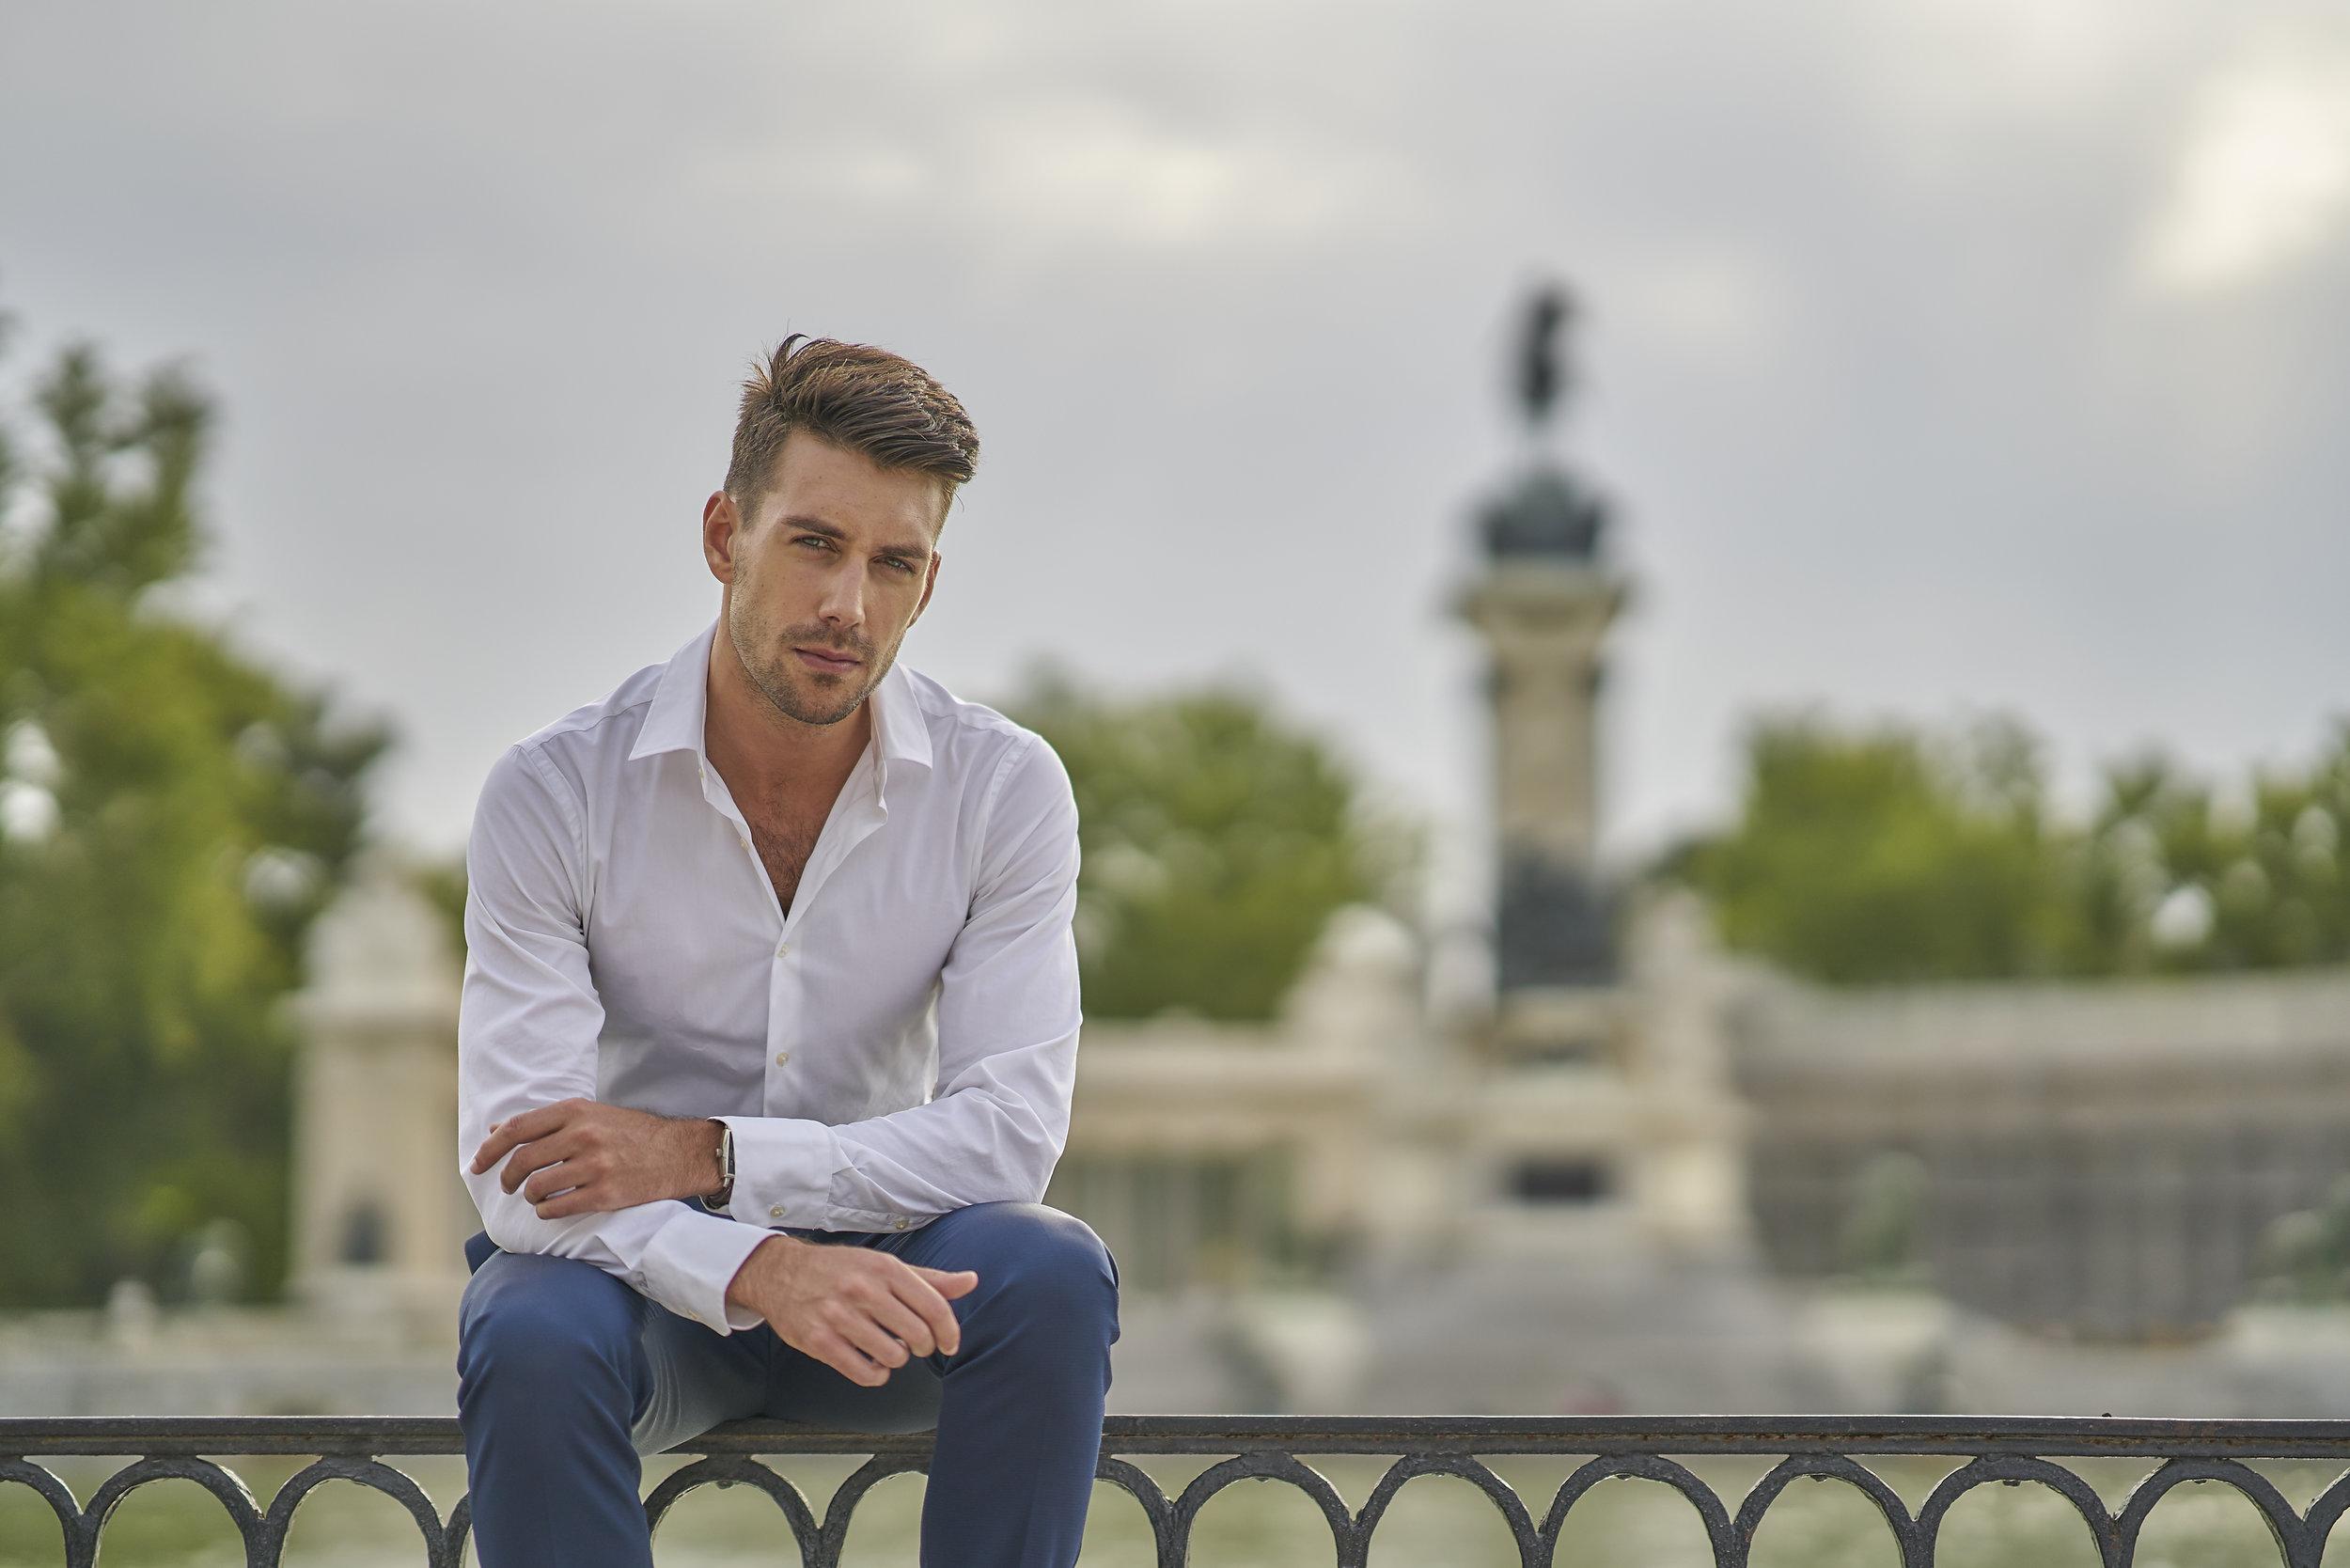 2017-07-17-Anthony Lorca, Madrid-C1Pro10_DSC7139.jpg